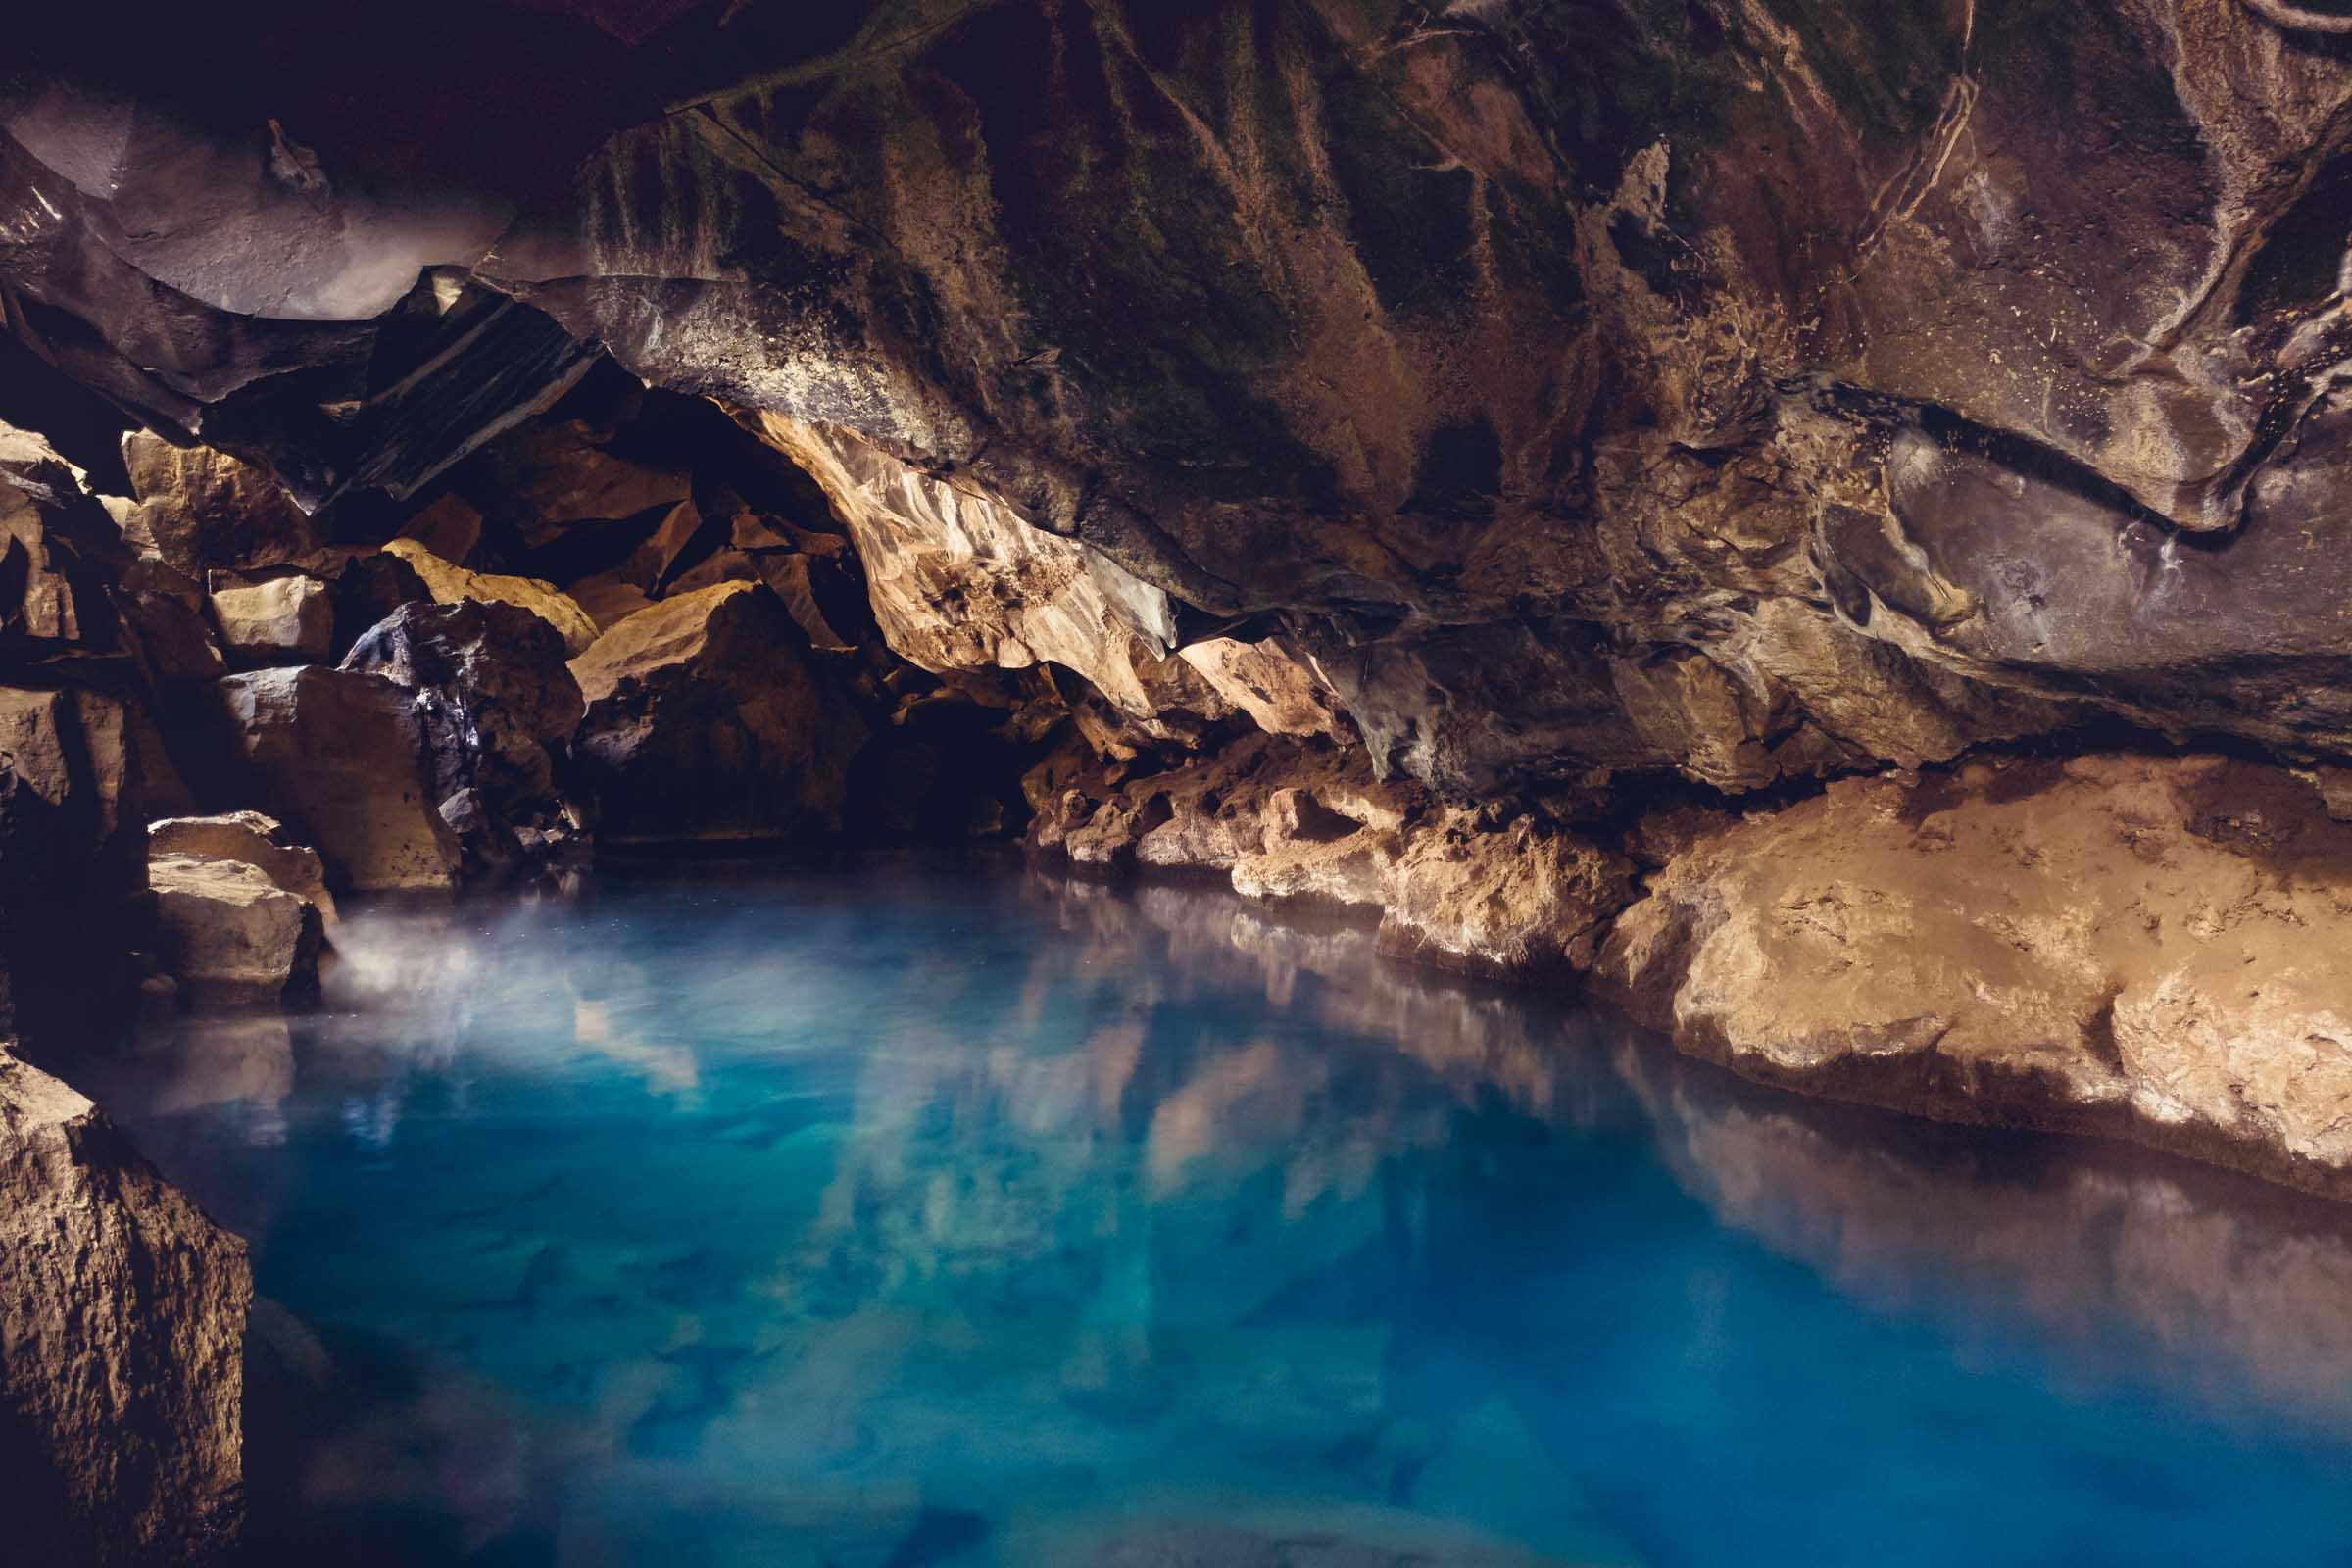 Grjótagjá Cave from Game of Thrones